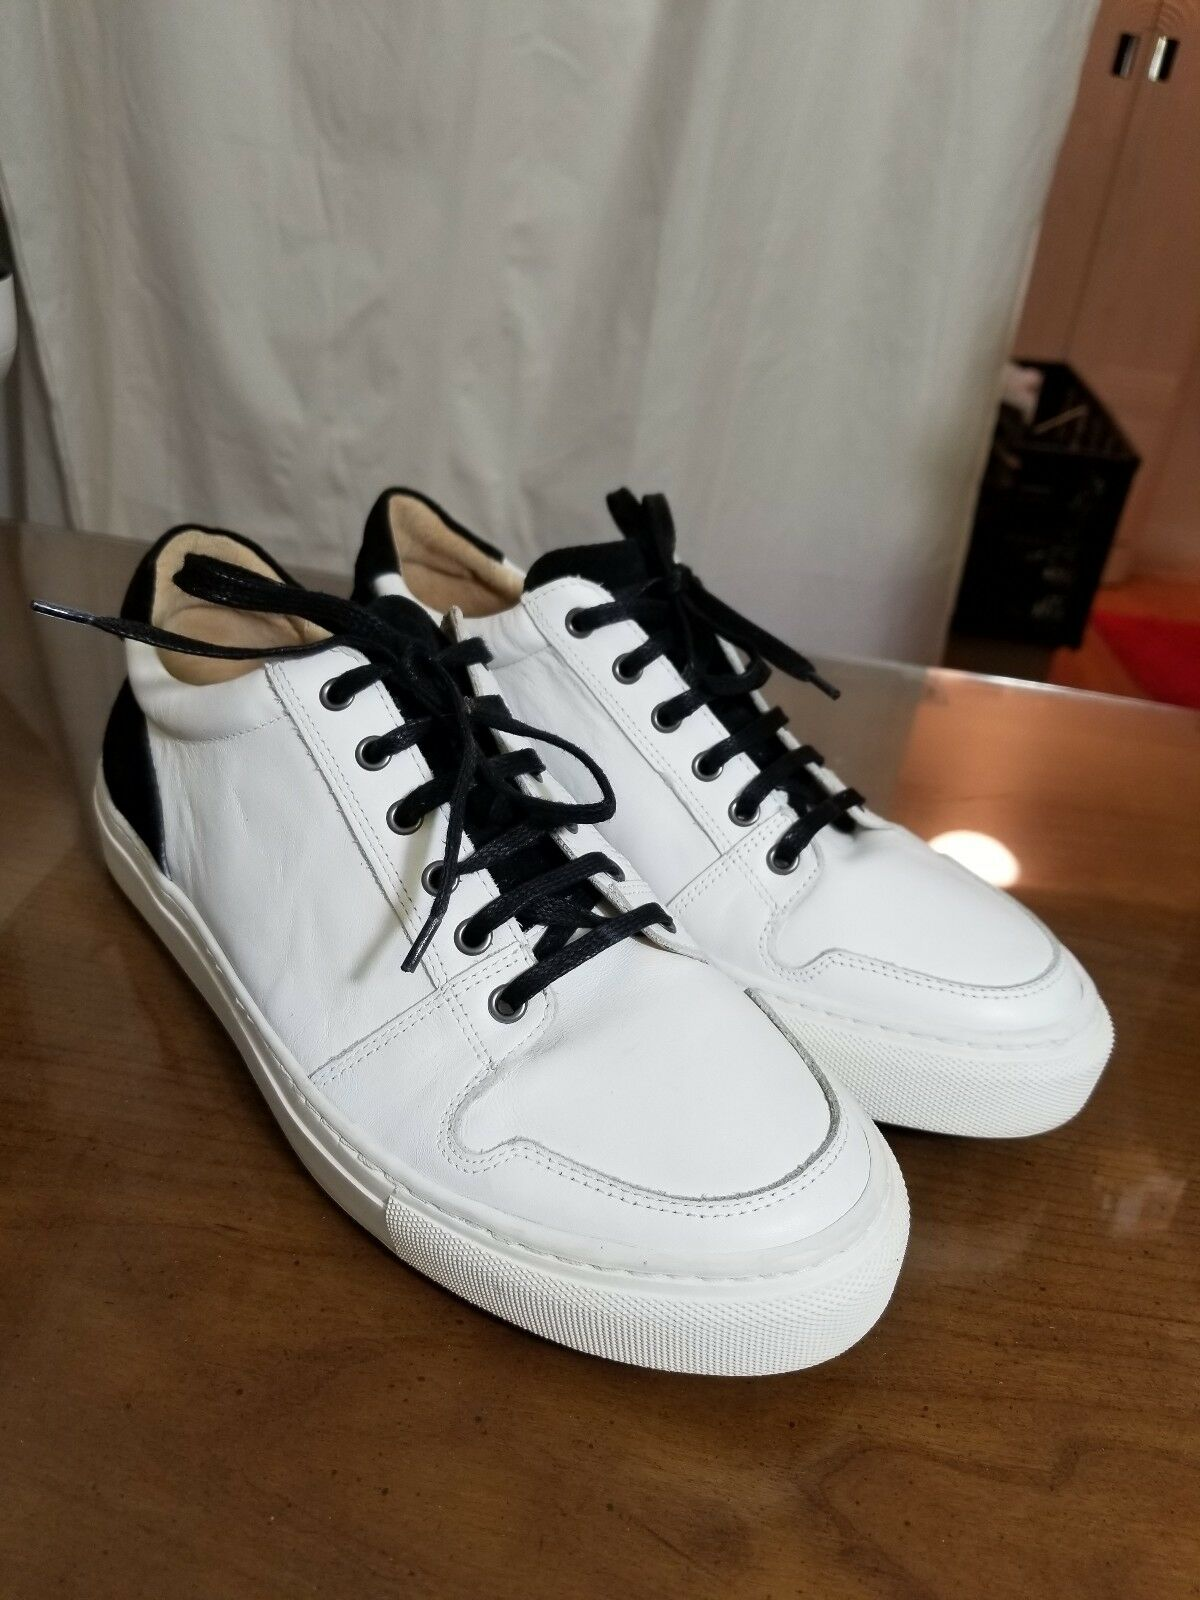 ALPHAKILO Grady Sneaker Men's size 9.5 White Black Leather